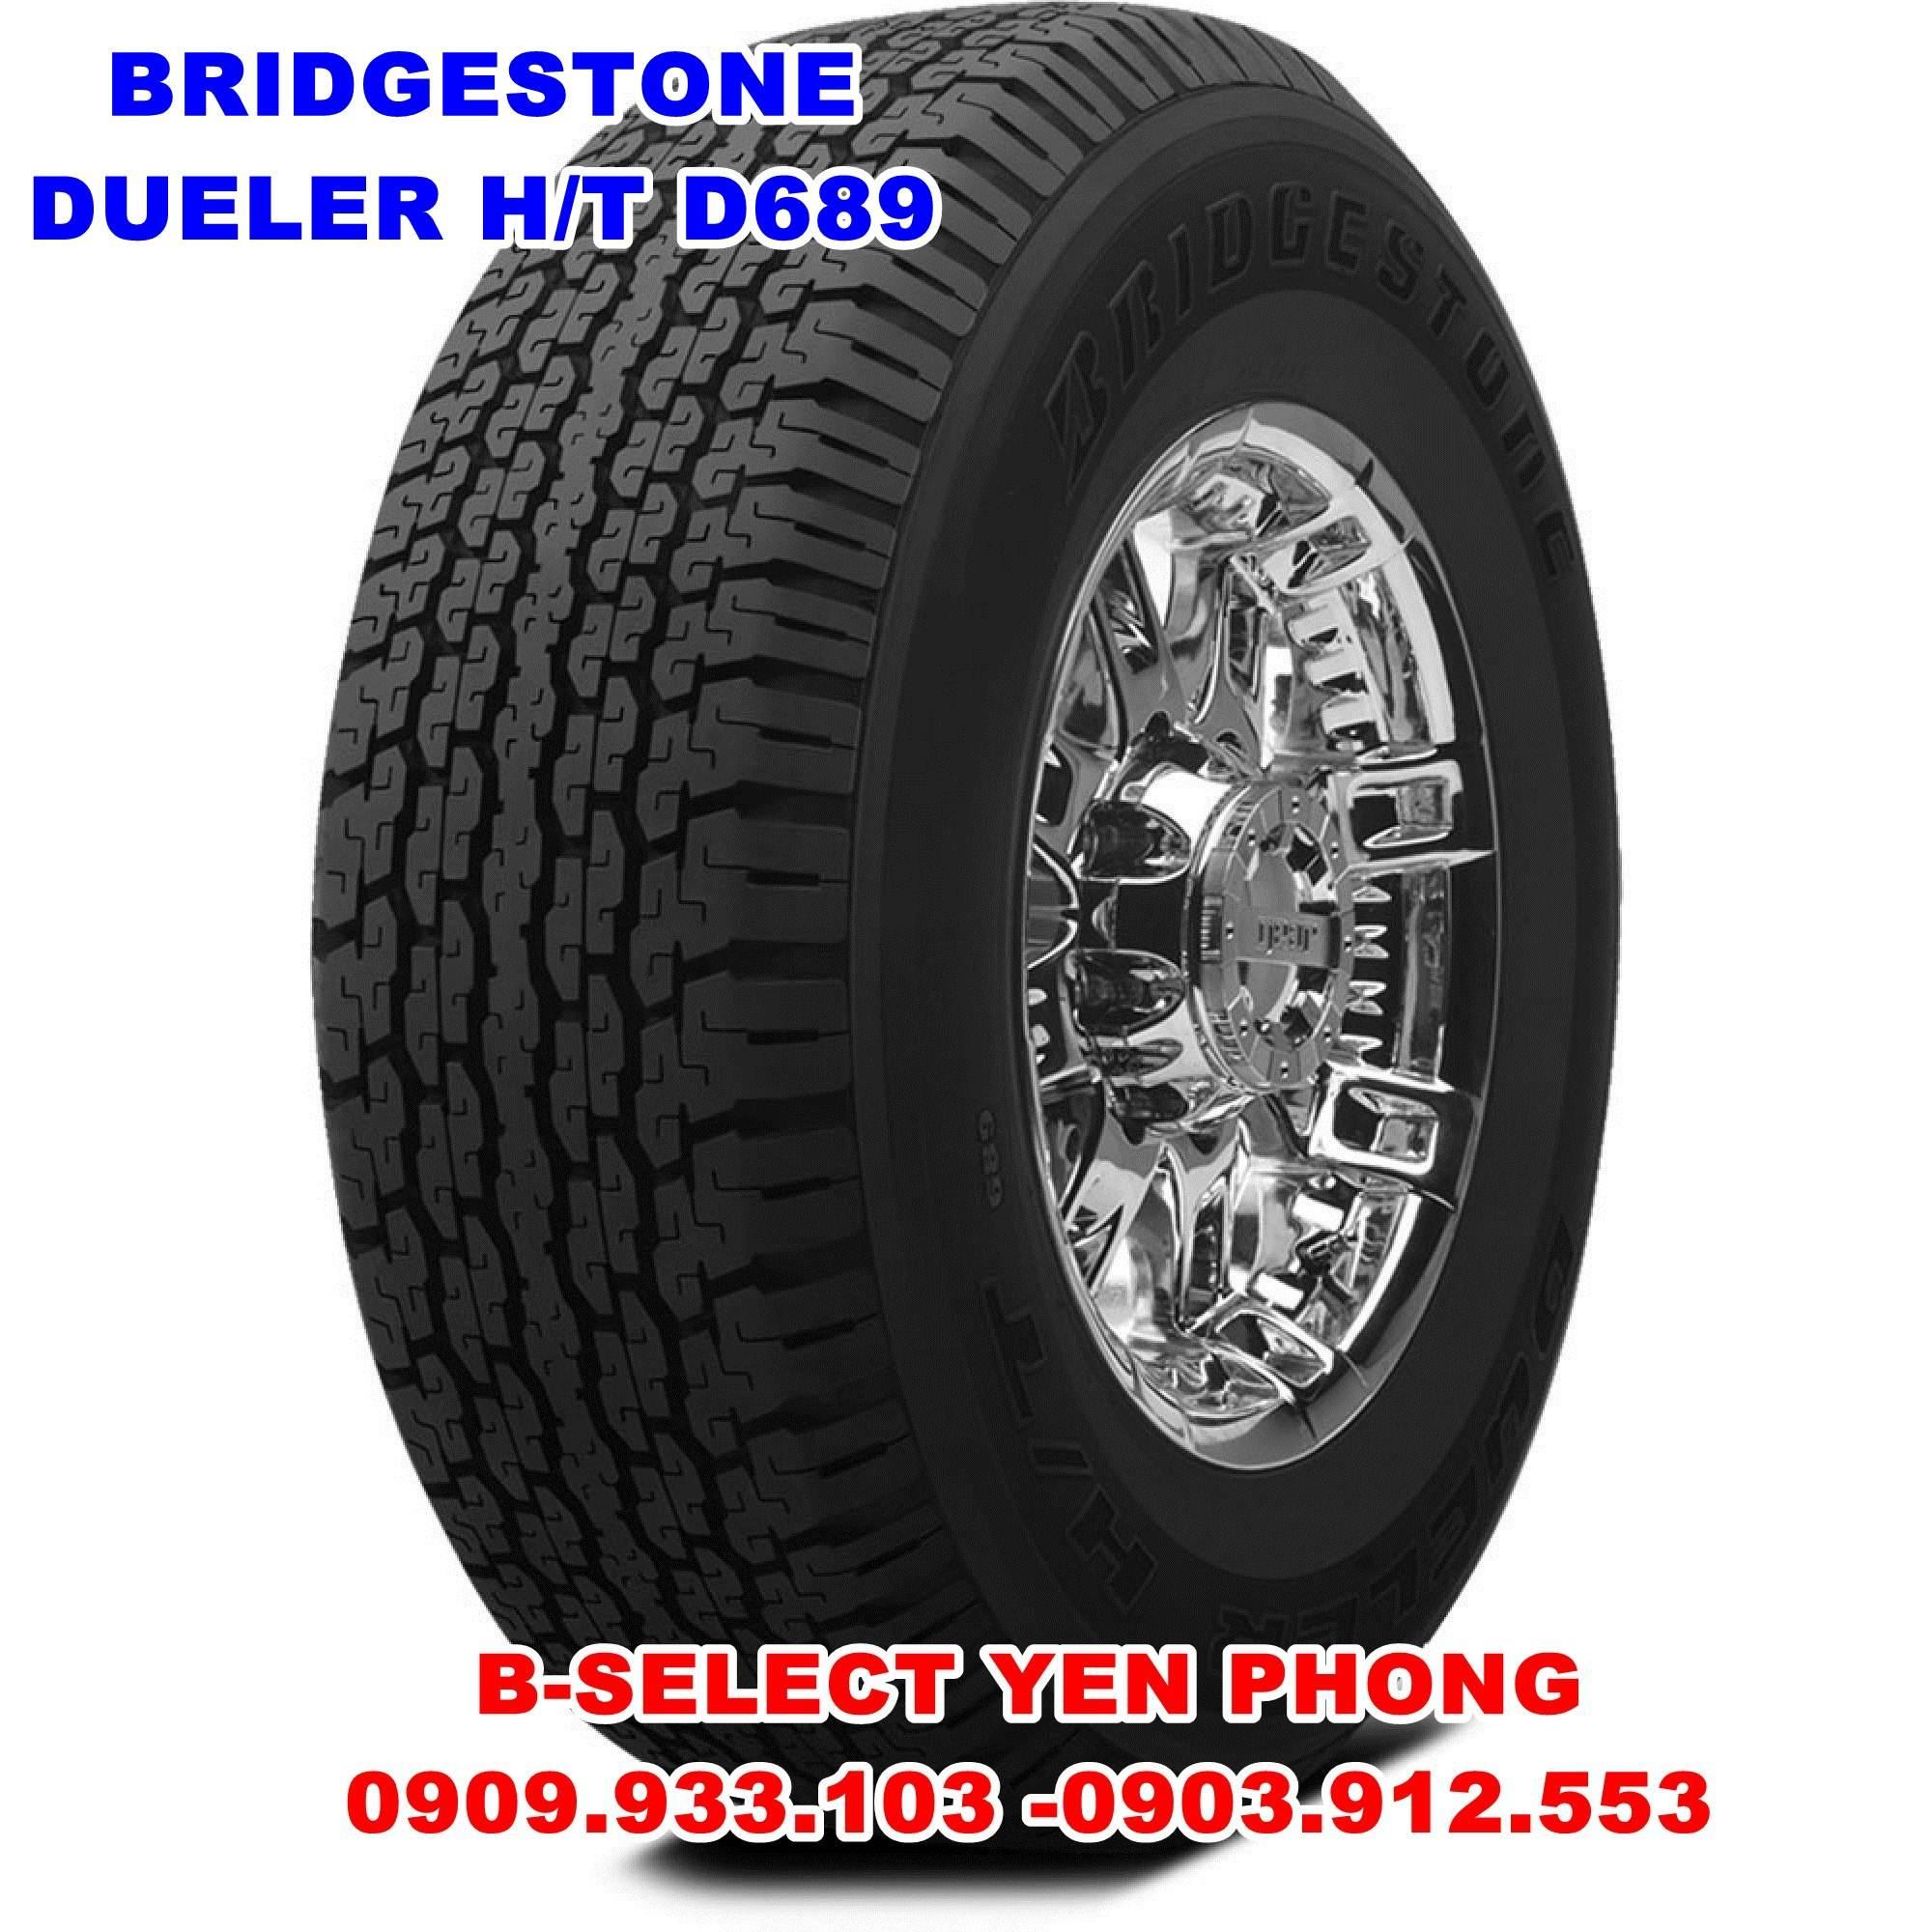 Lốp Xe Du Lịch Bridgestone Dueler 235/70R16 D689